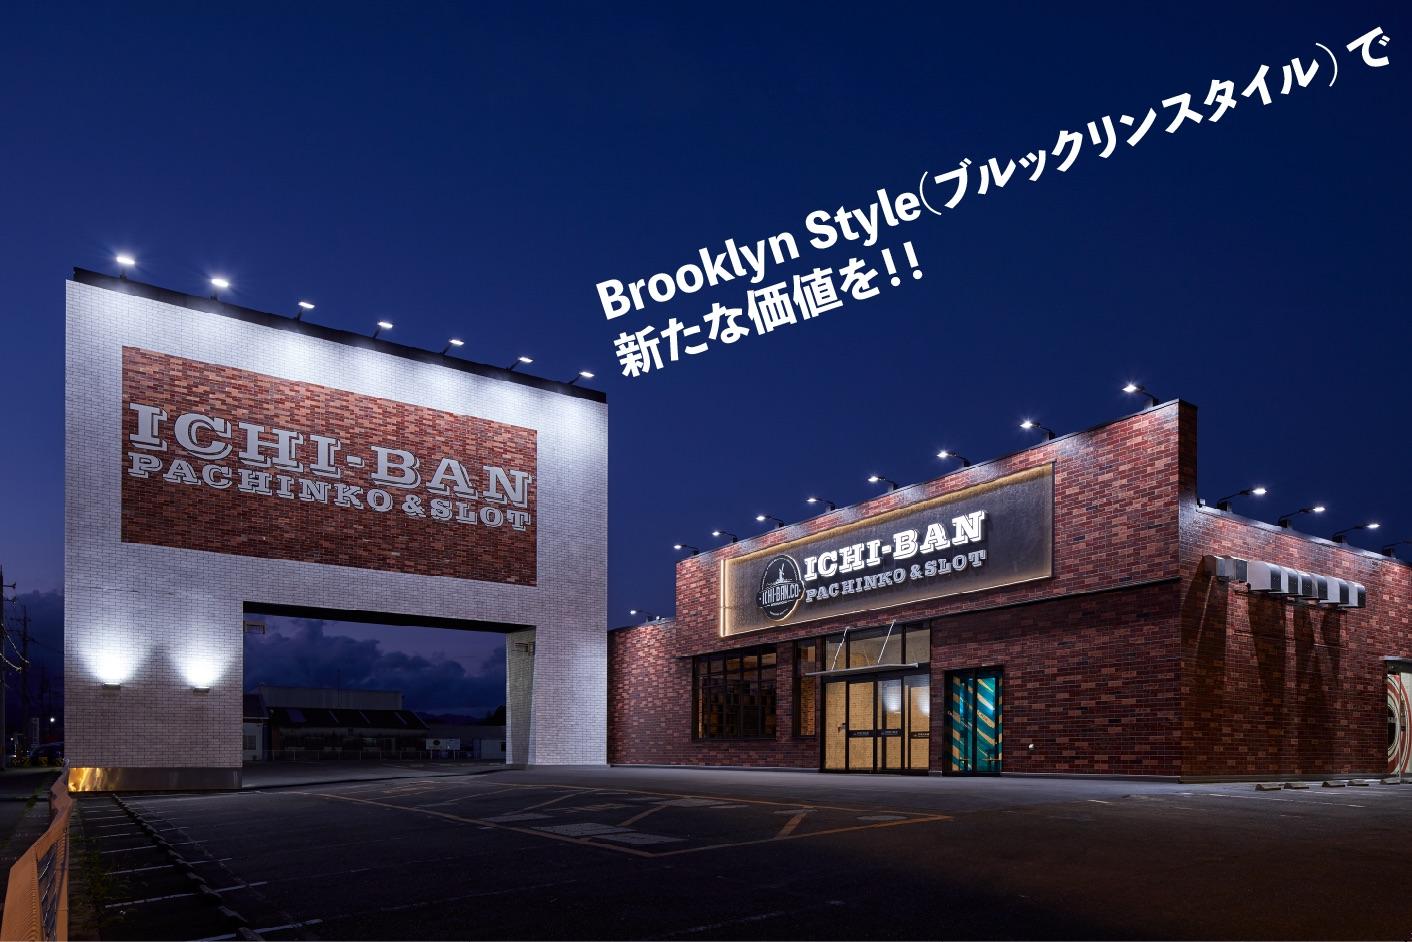 Brooklyn Style(ブルックリンスタイル) で新たな価値を!